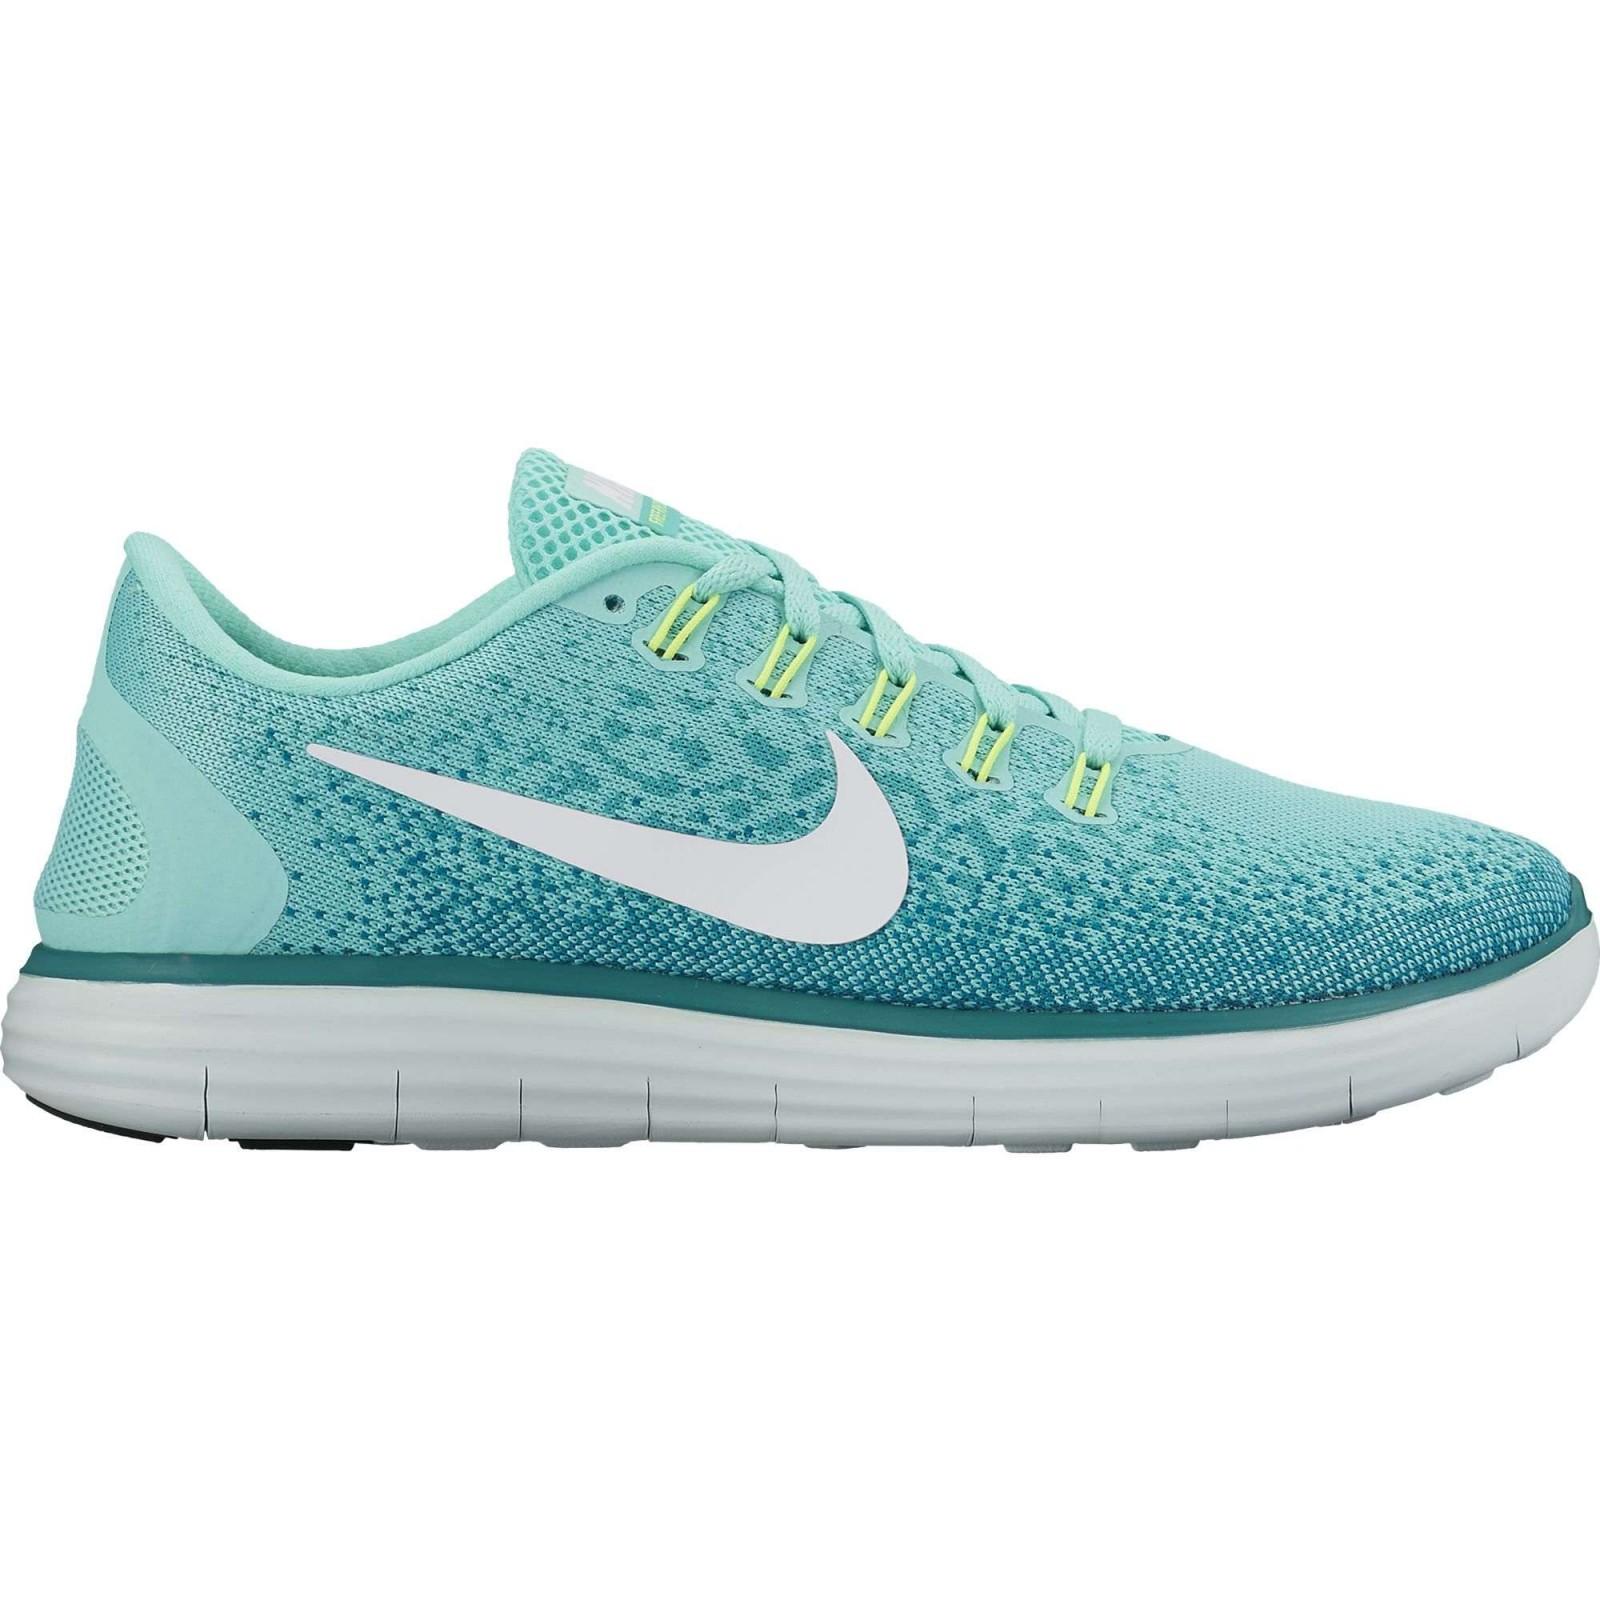 5172eee37eb Dámské běžecké boty Nike WMNS FREE RN DISTANCE